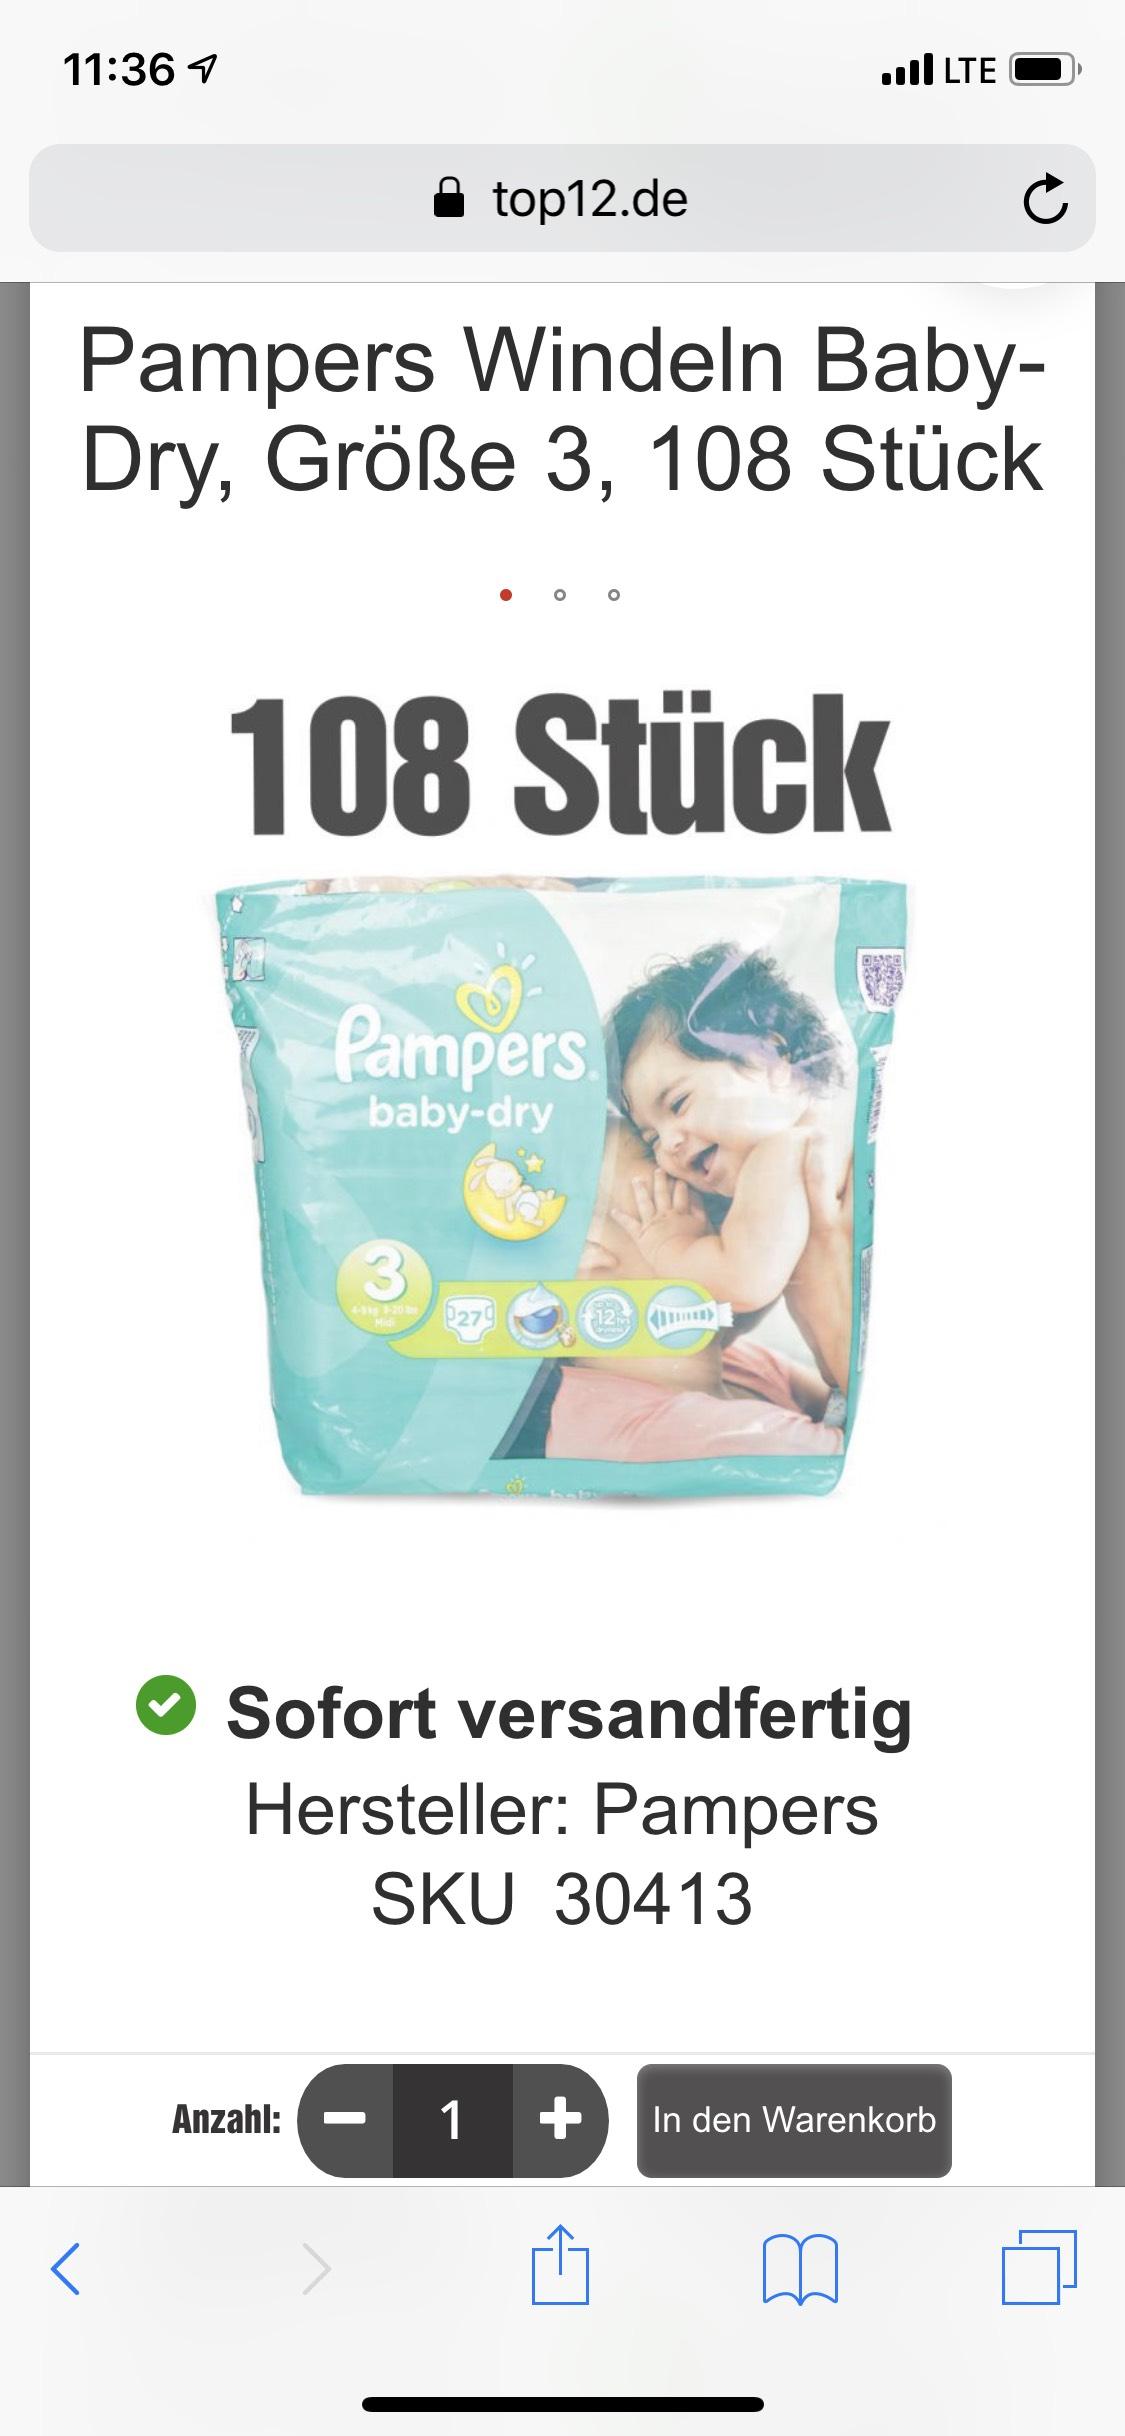 Top12 - Pampers Windeln Baby-Dry, Größe 3, 108 Stück